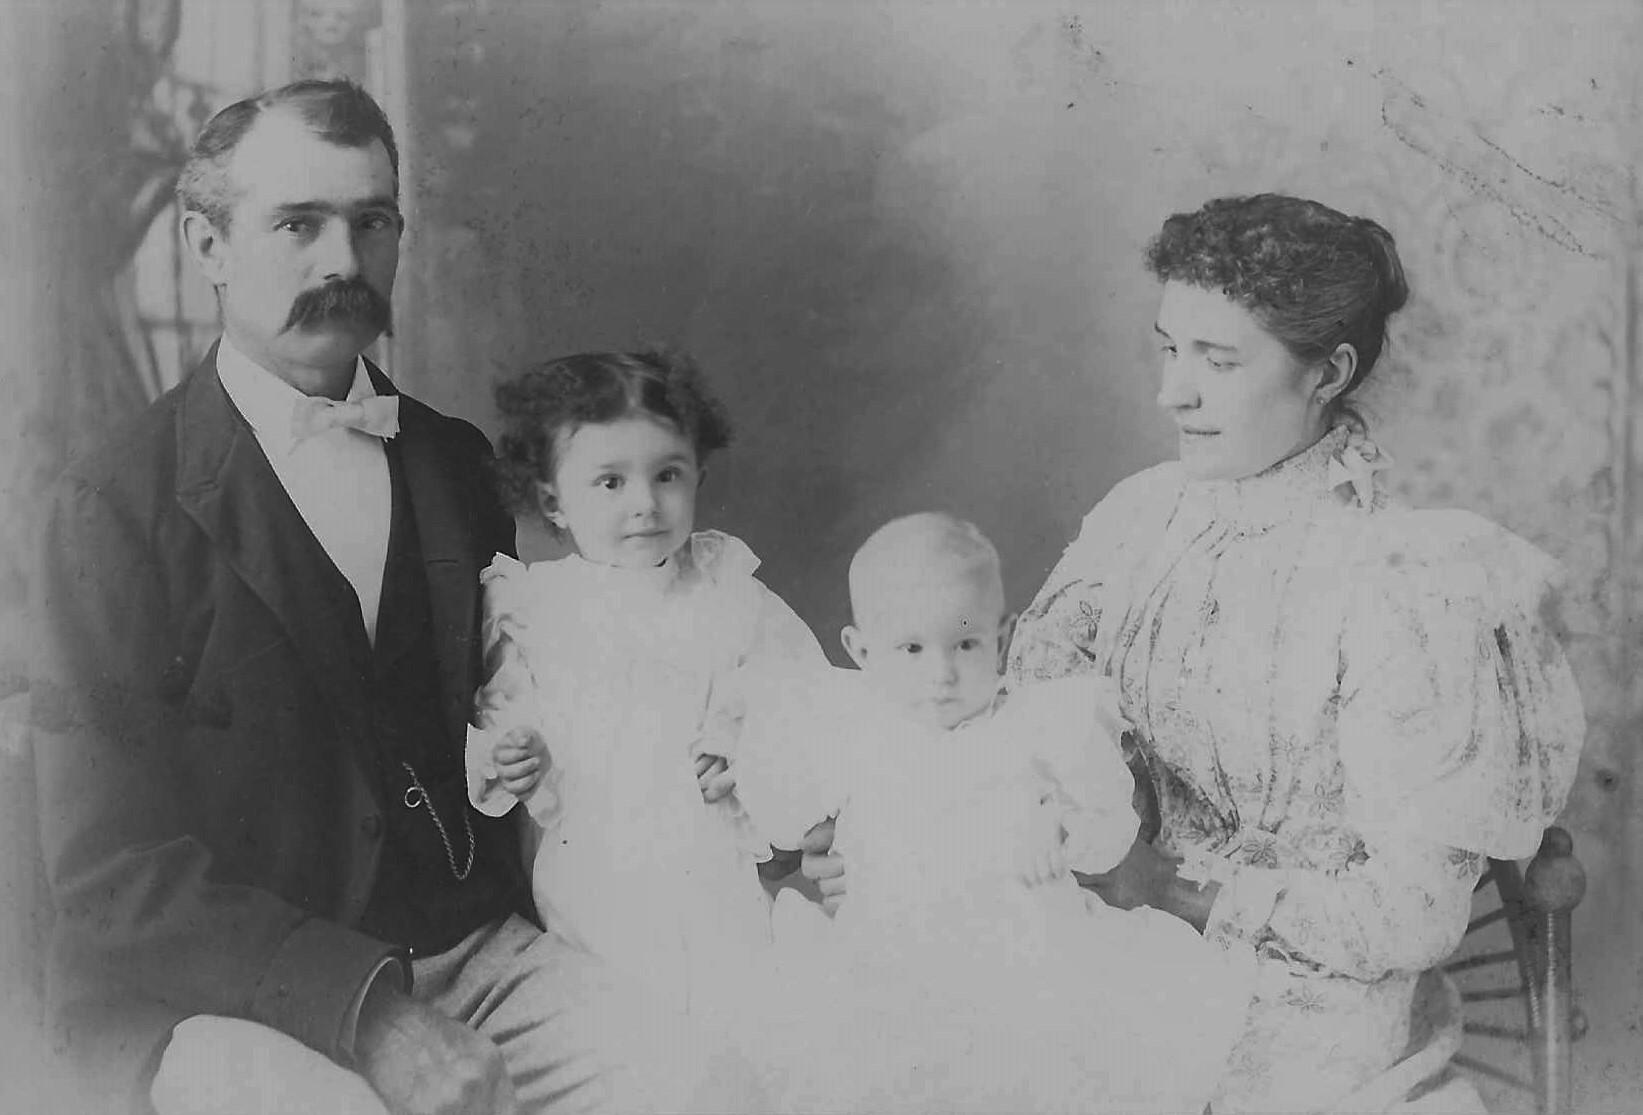 Thomas and Anna Townsend Quantic, Hermina and Berton circa 1897